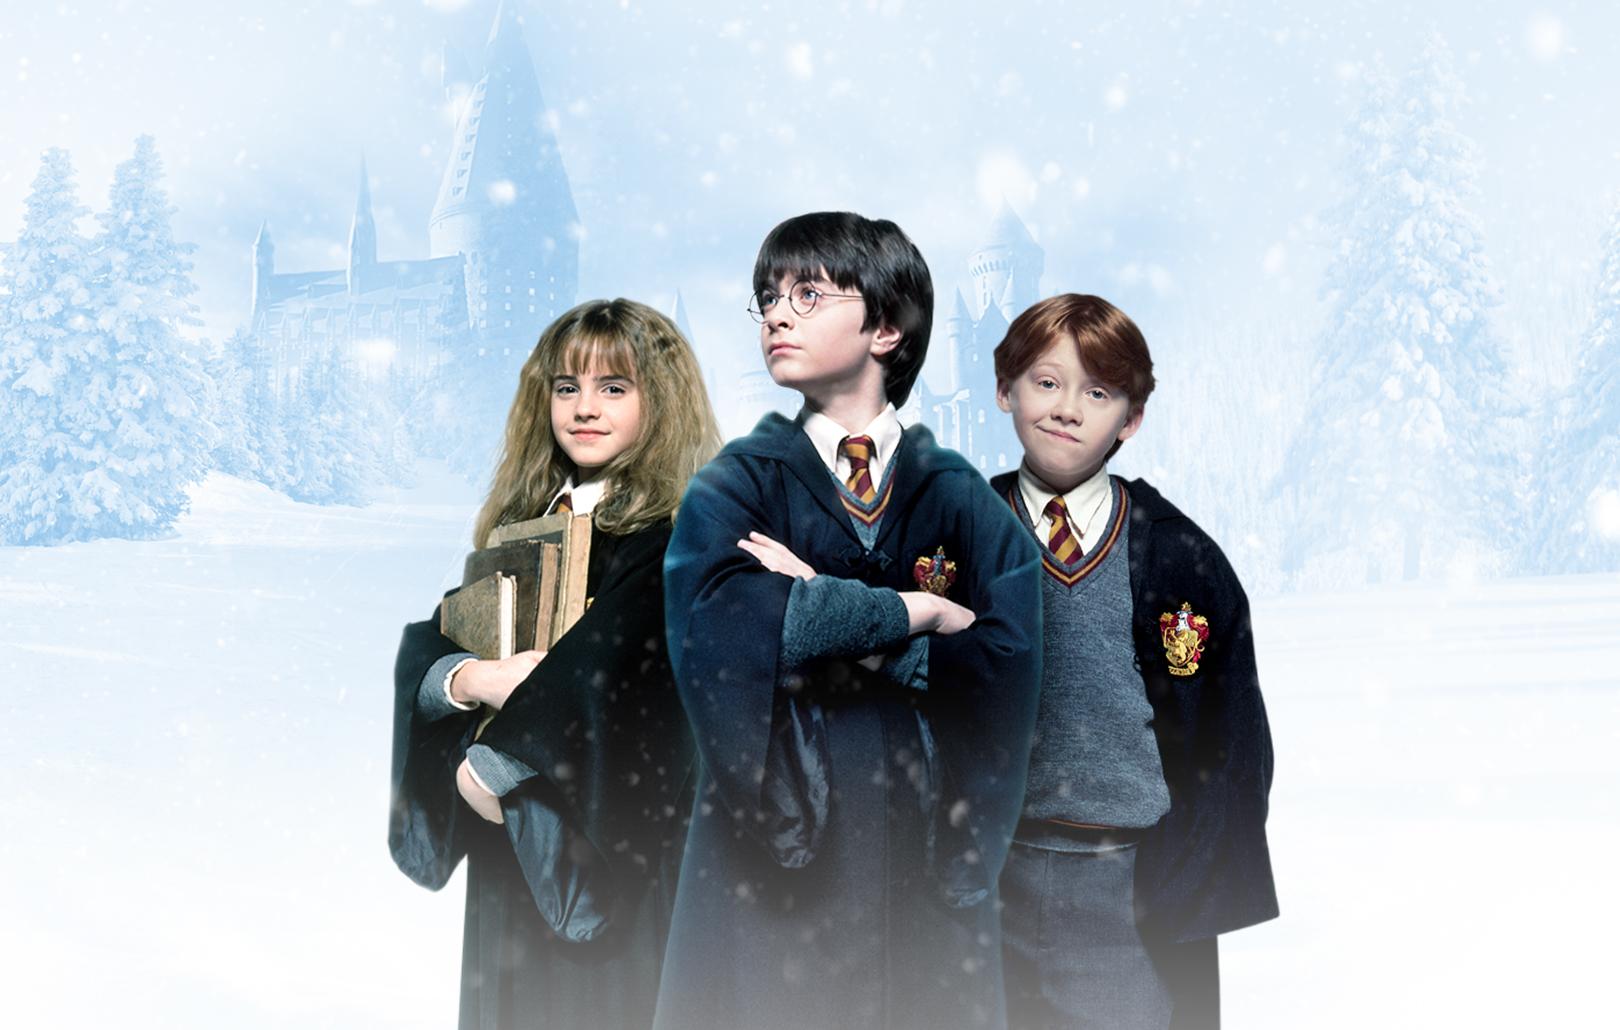 Гарри Поттер: все части